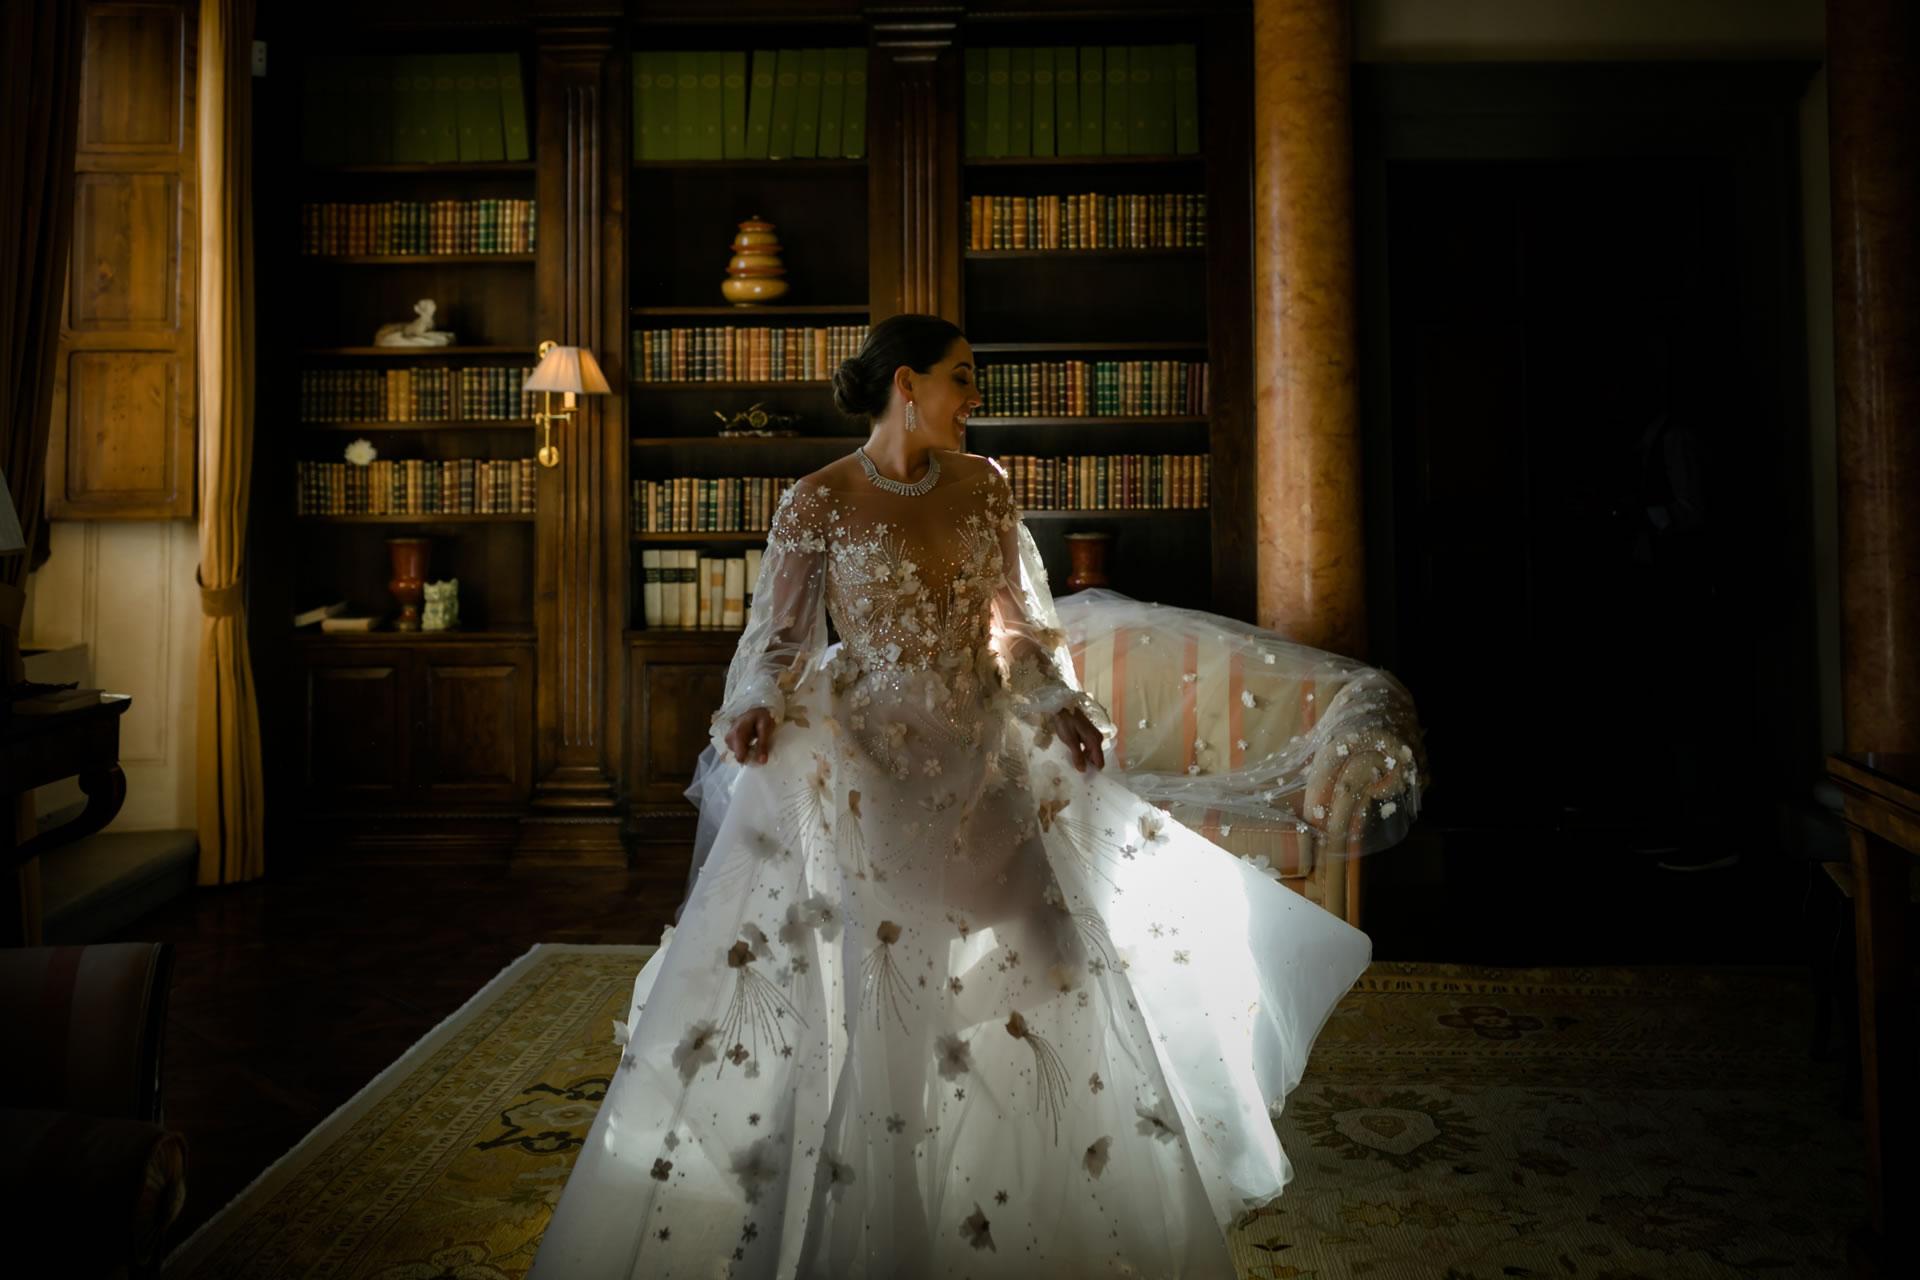 Movement - 10 :: Luxury wedding at Il Borro :: Luxury wedding photography - 9 :: Movement - 10